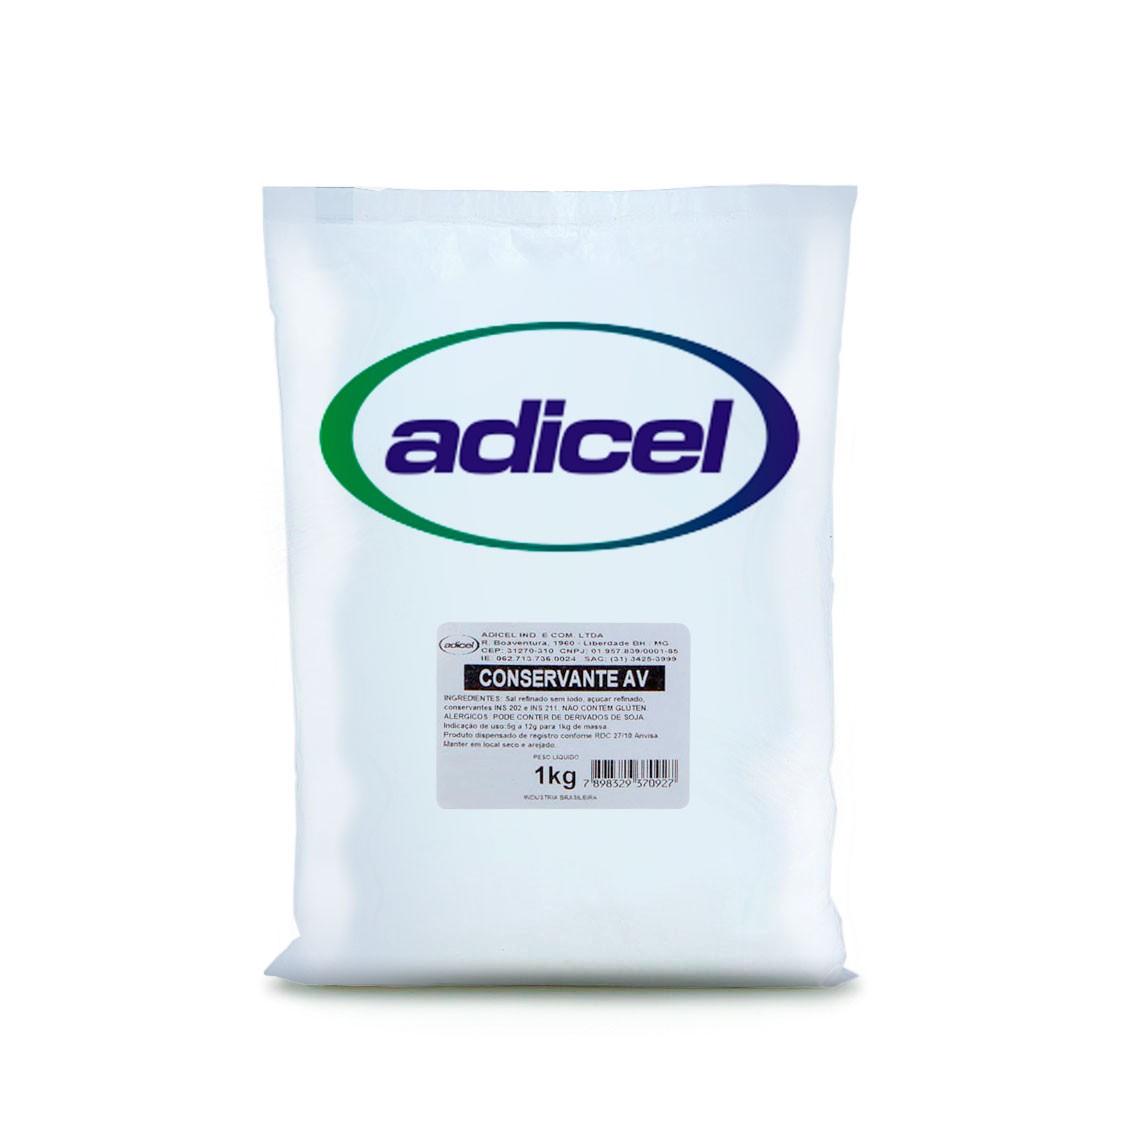 Conservante AV Para Recheios E Molhos -1 kg